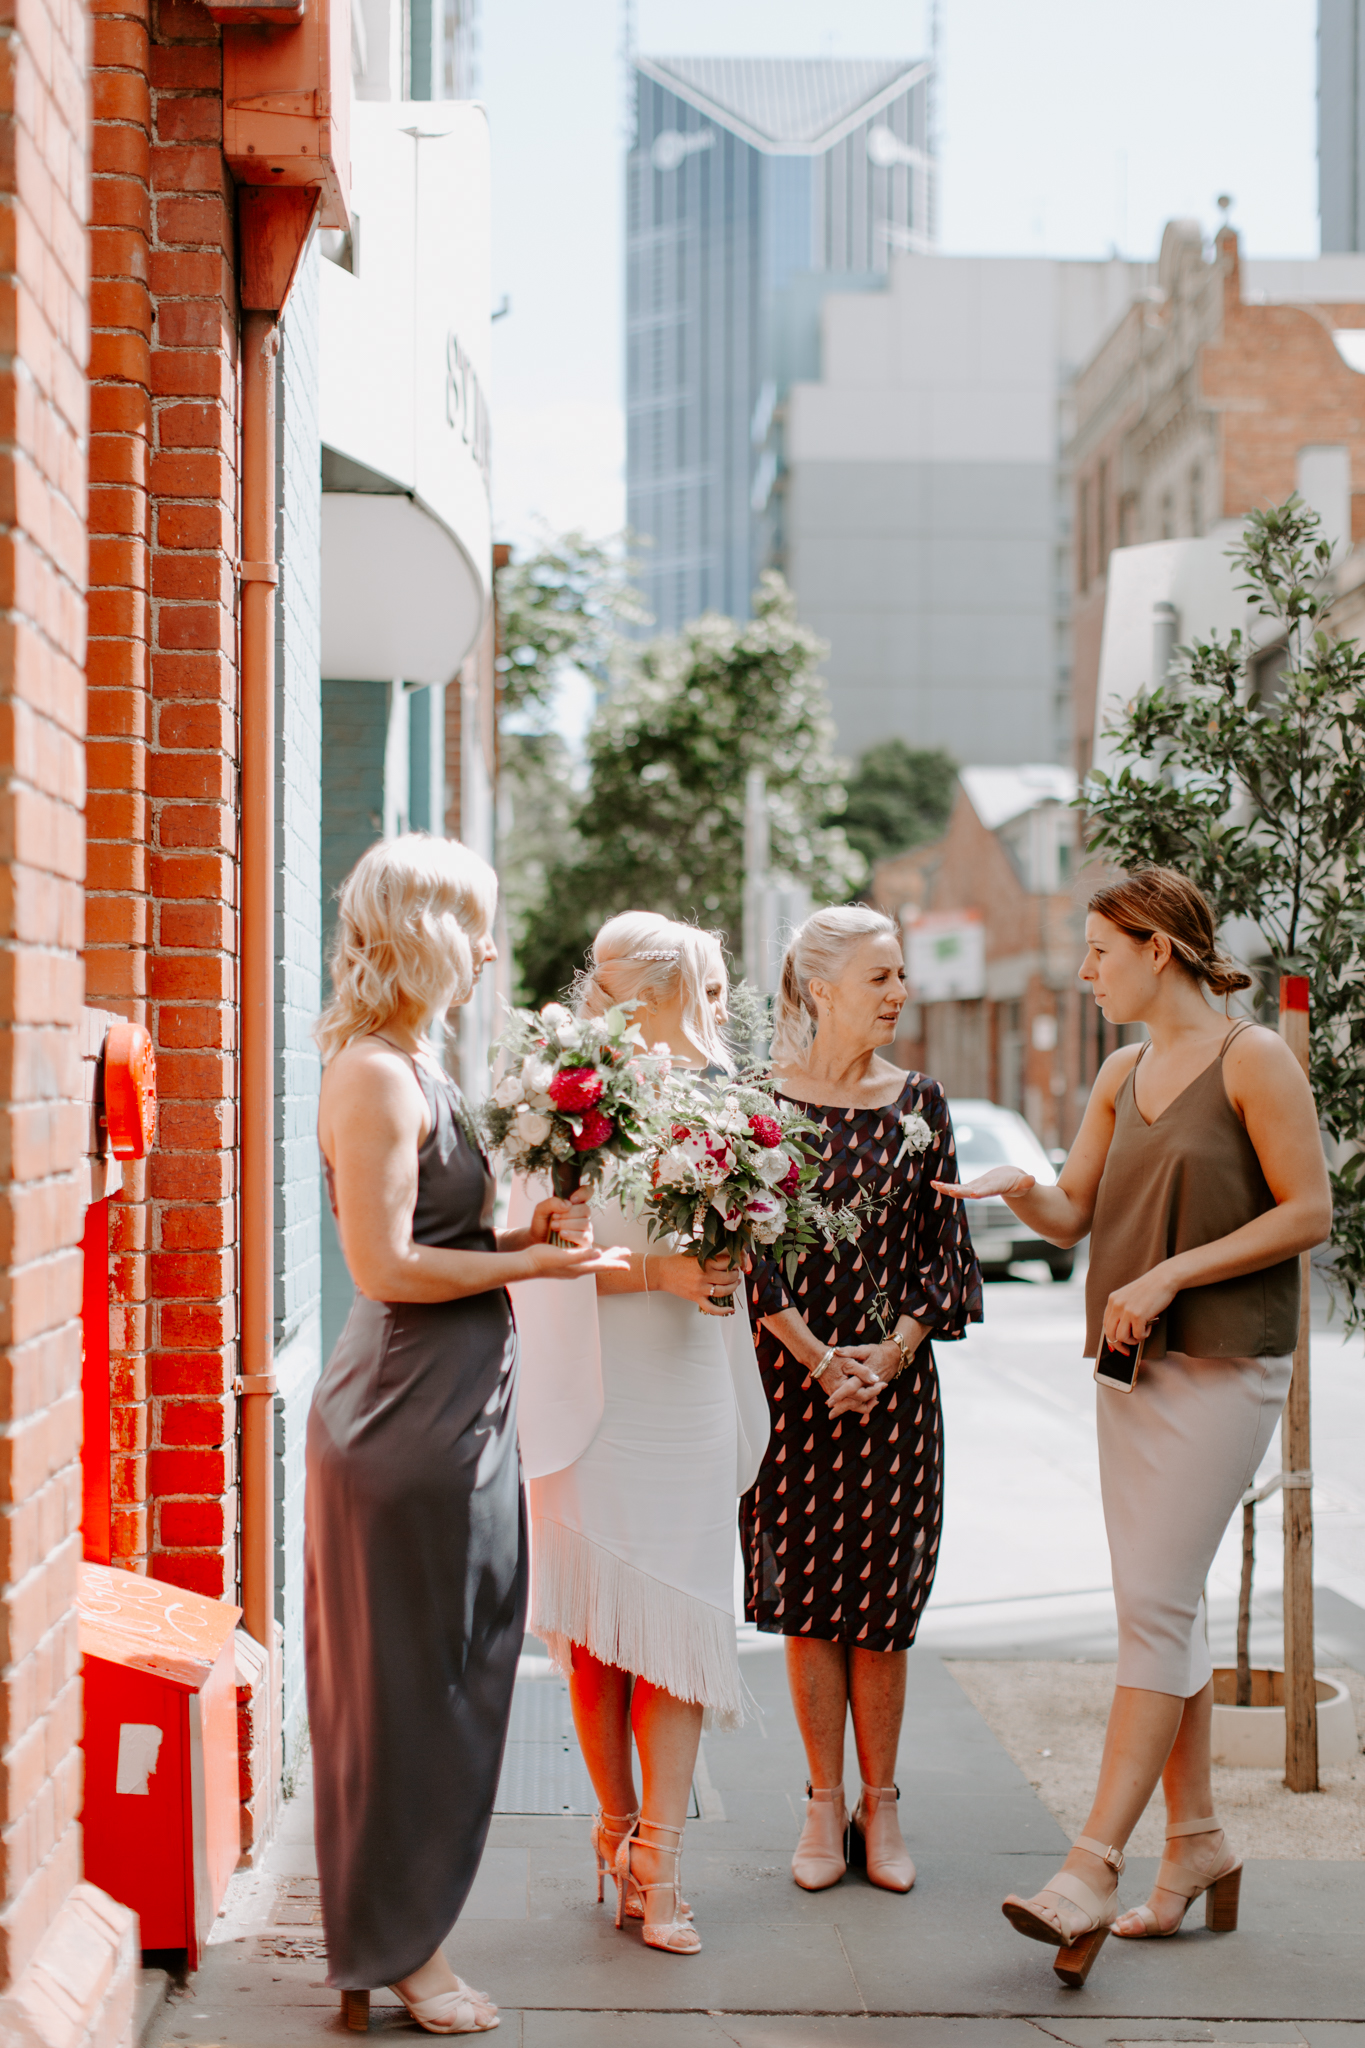 Trunk-restaurant-wedding-EmotionsandMath-007.jpg